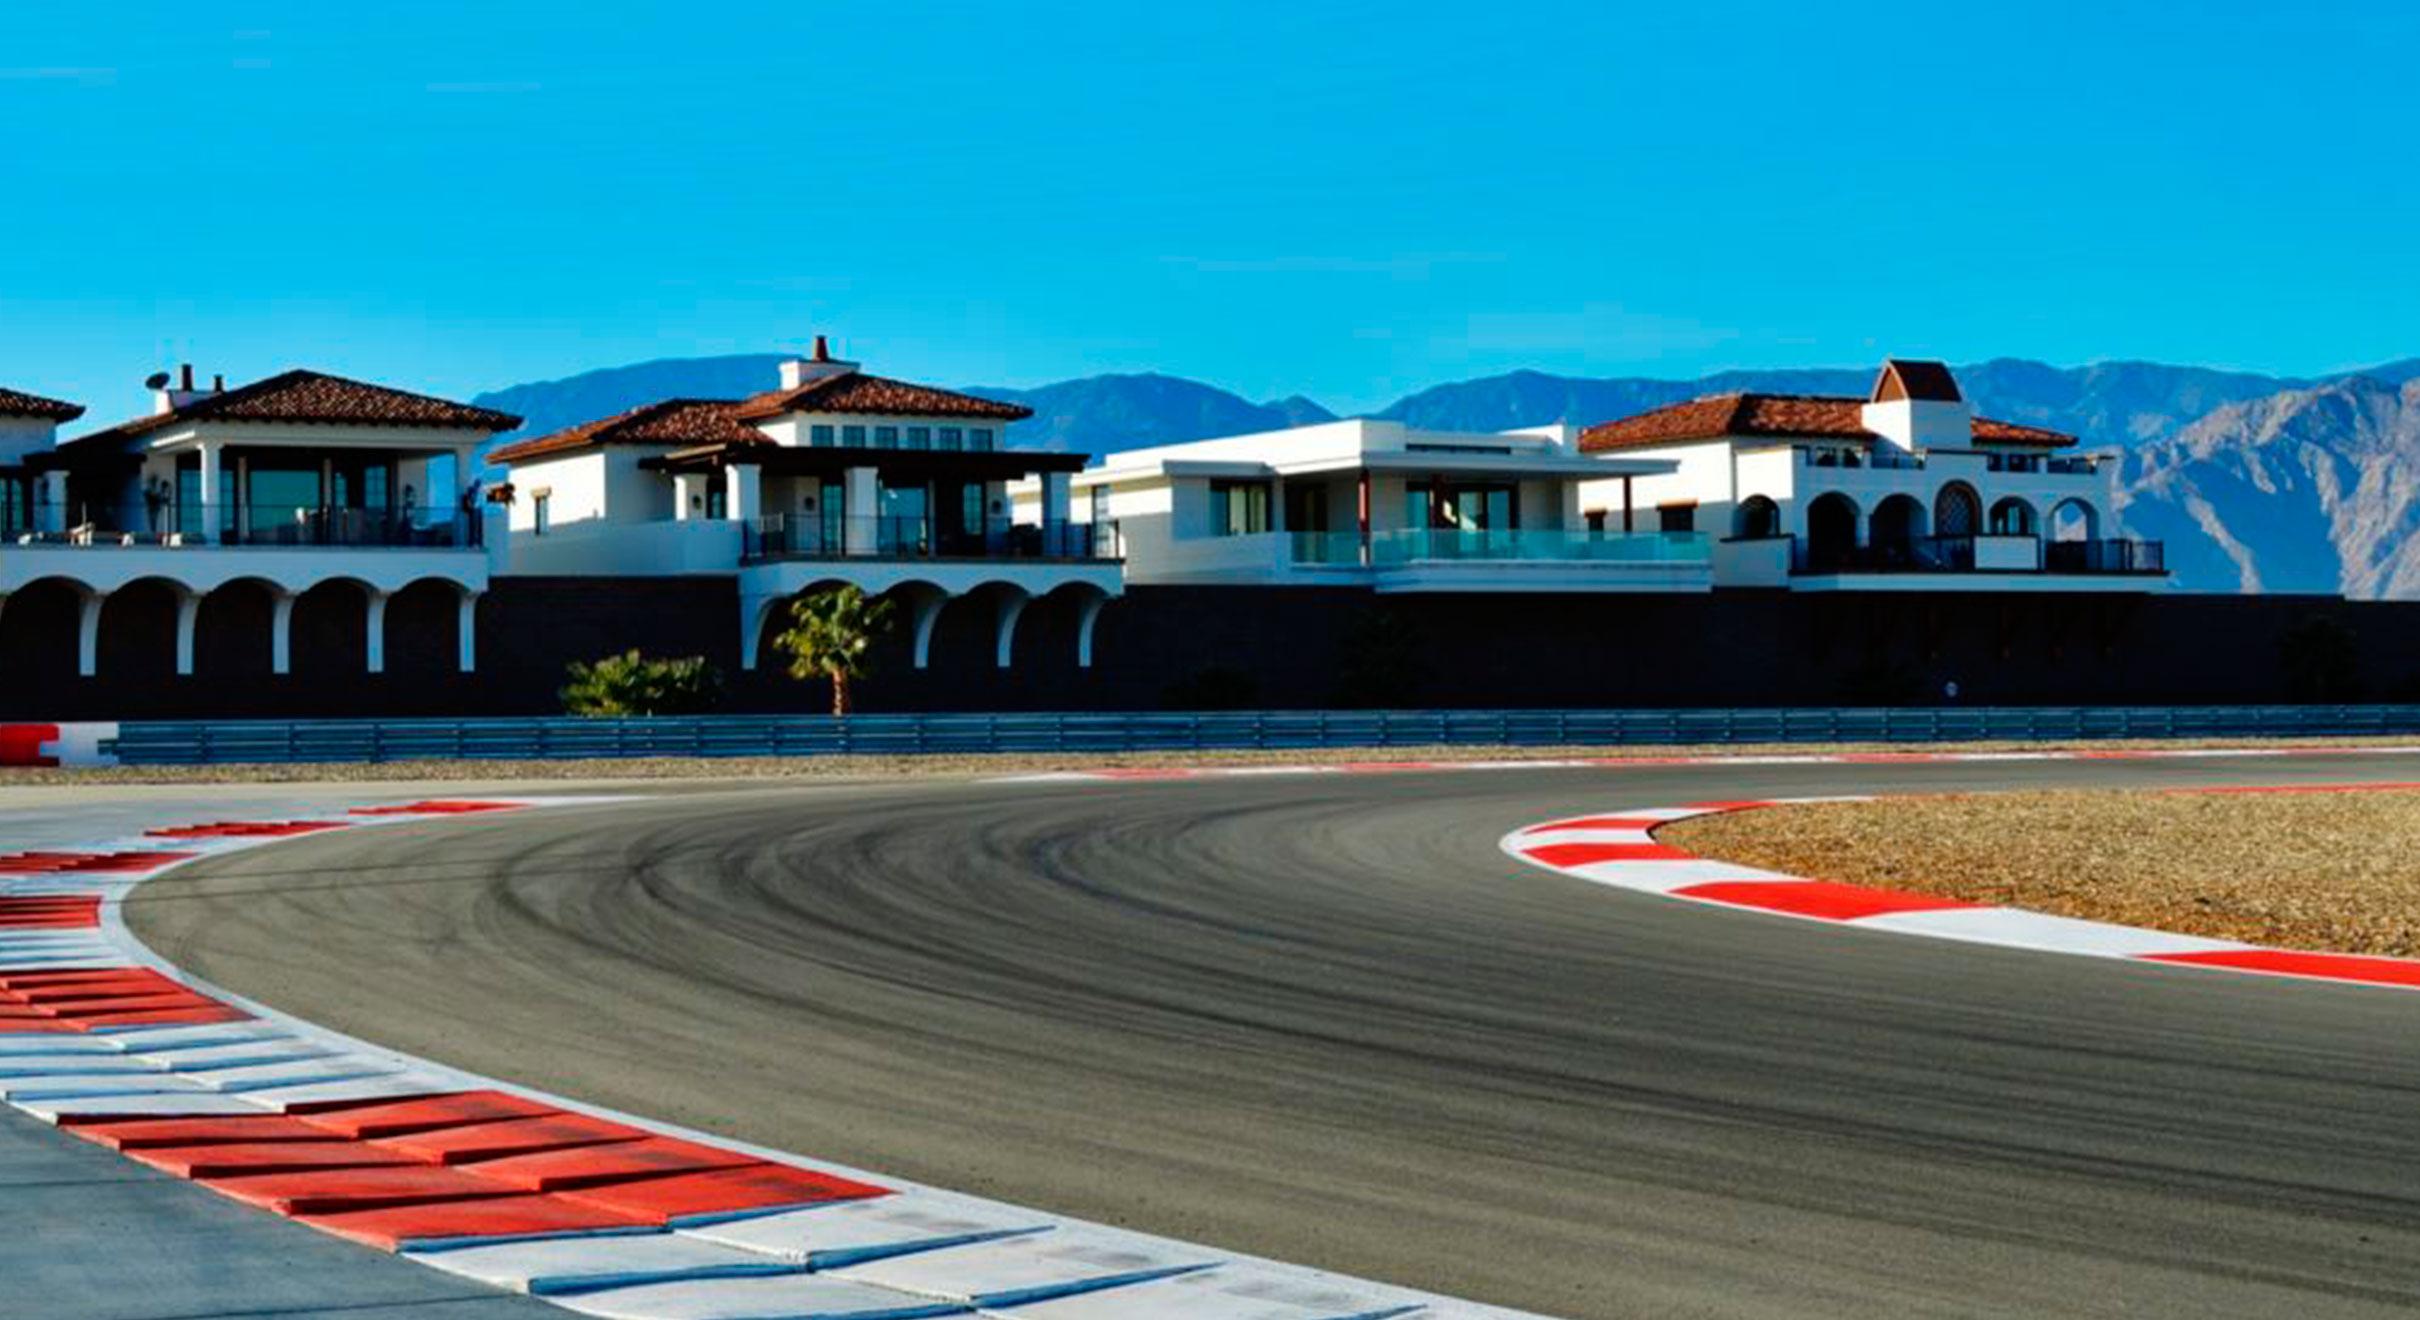 thermal-track-houses.jpg